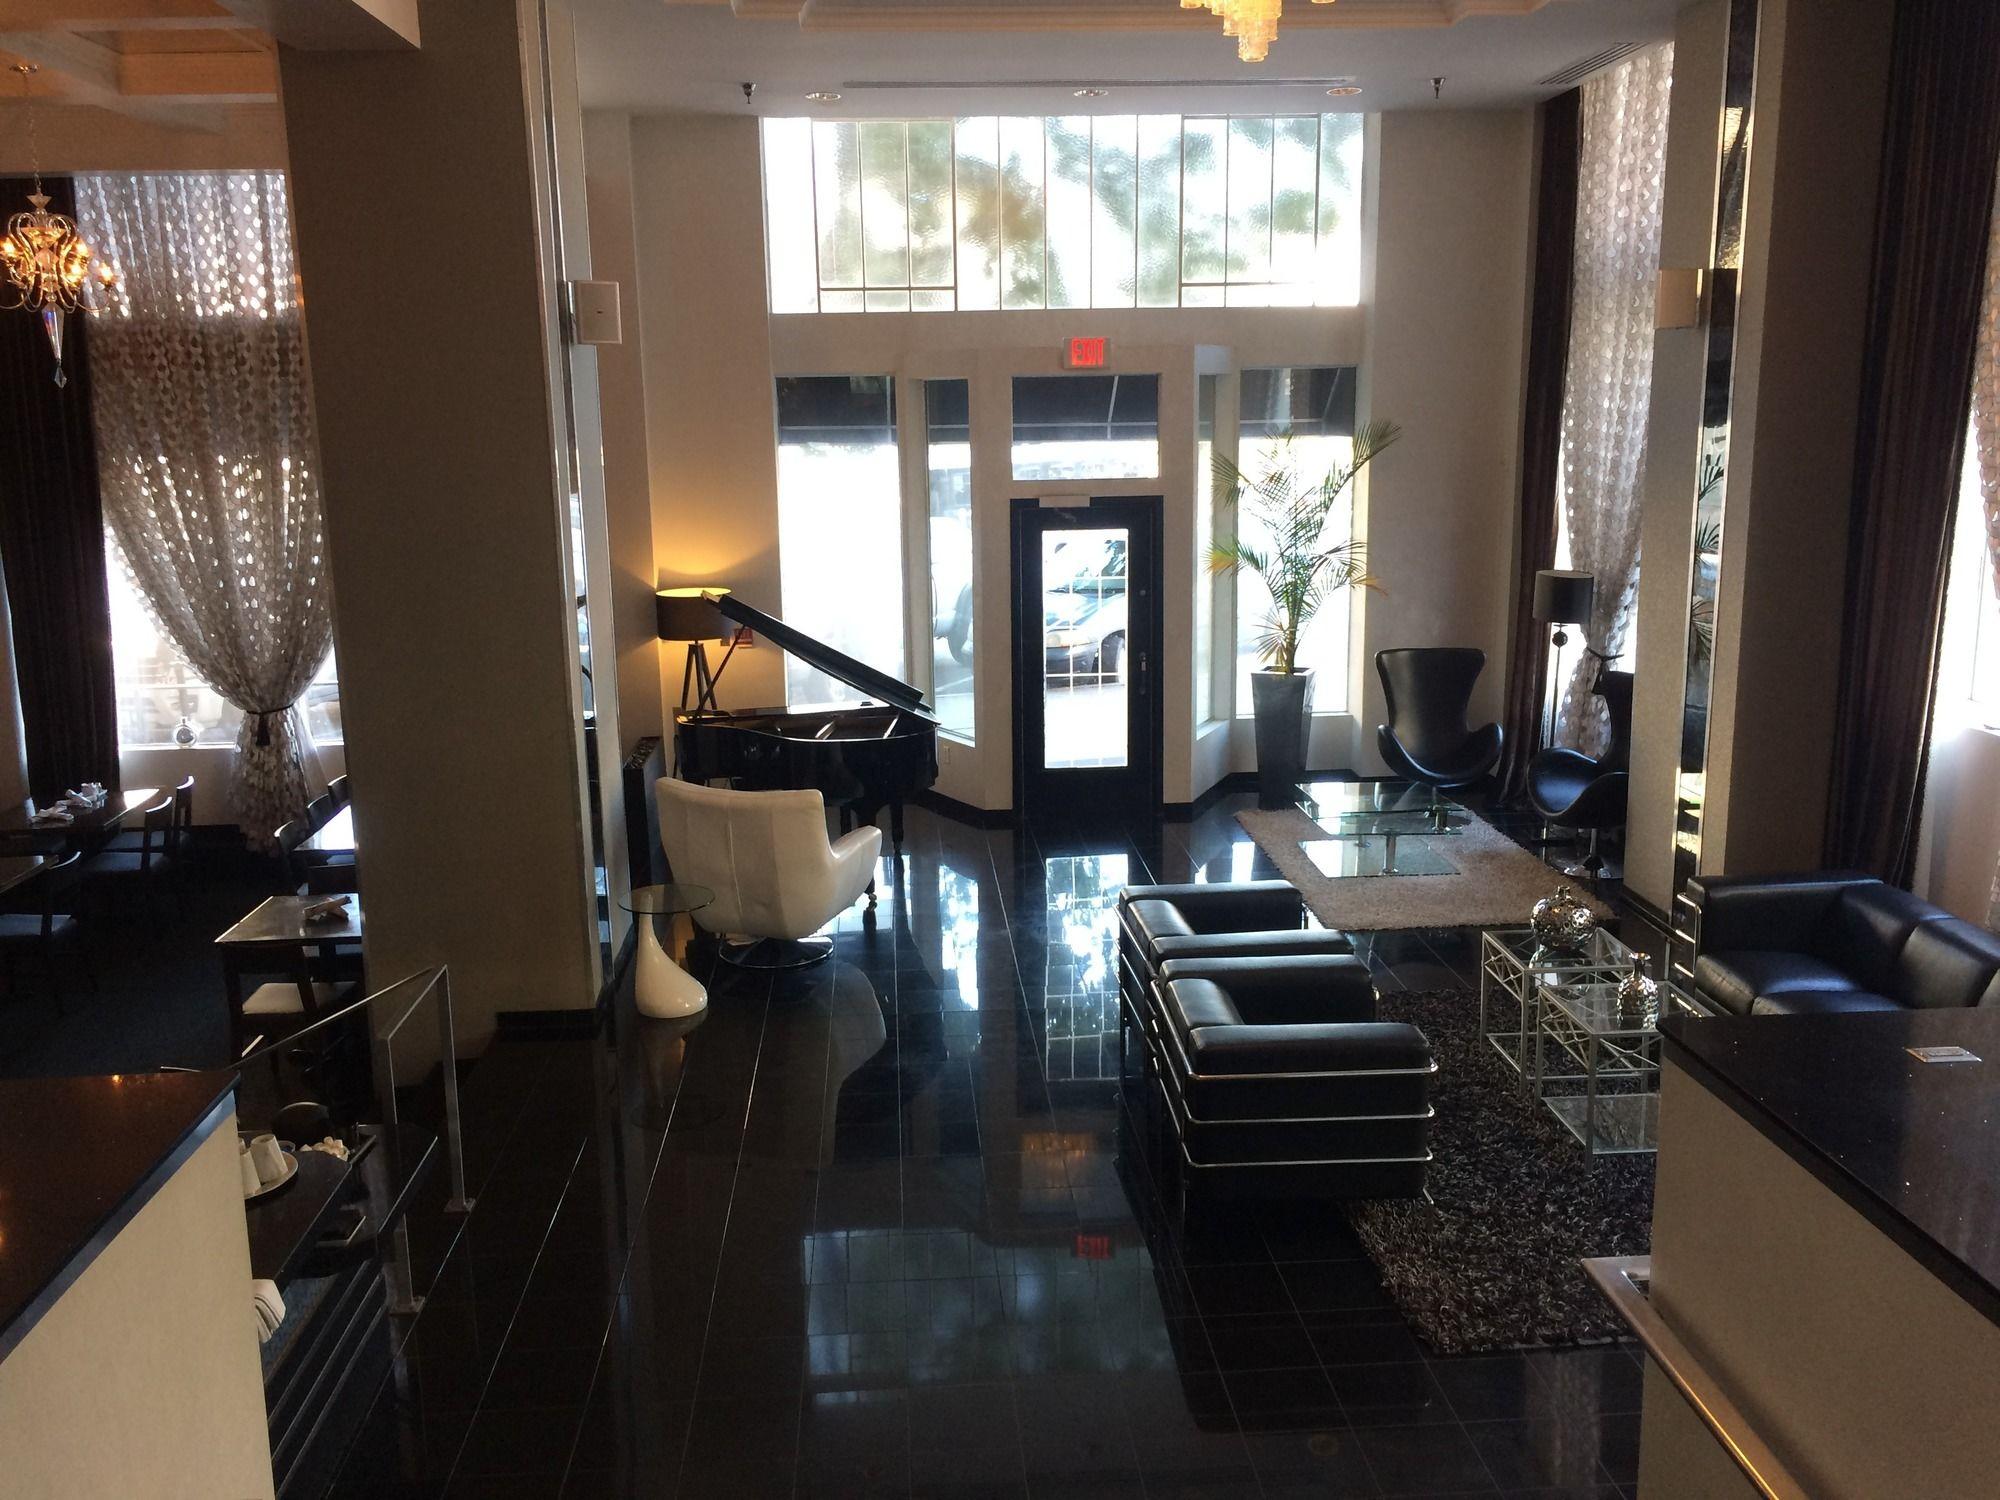 Discount Coupon For Hotel Deco Xv In Omaha Nebraska